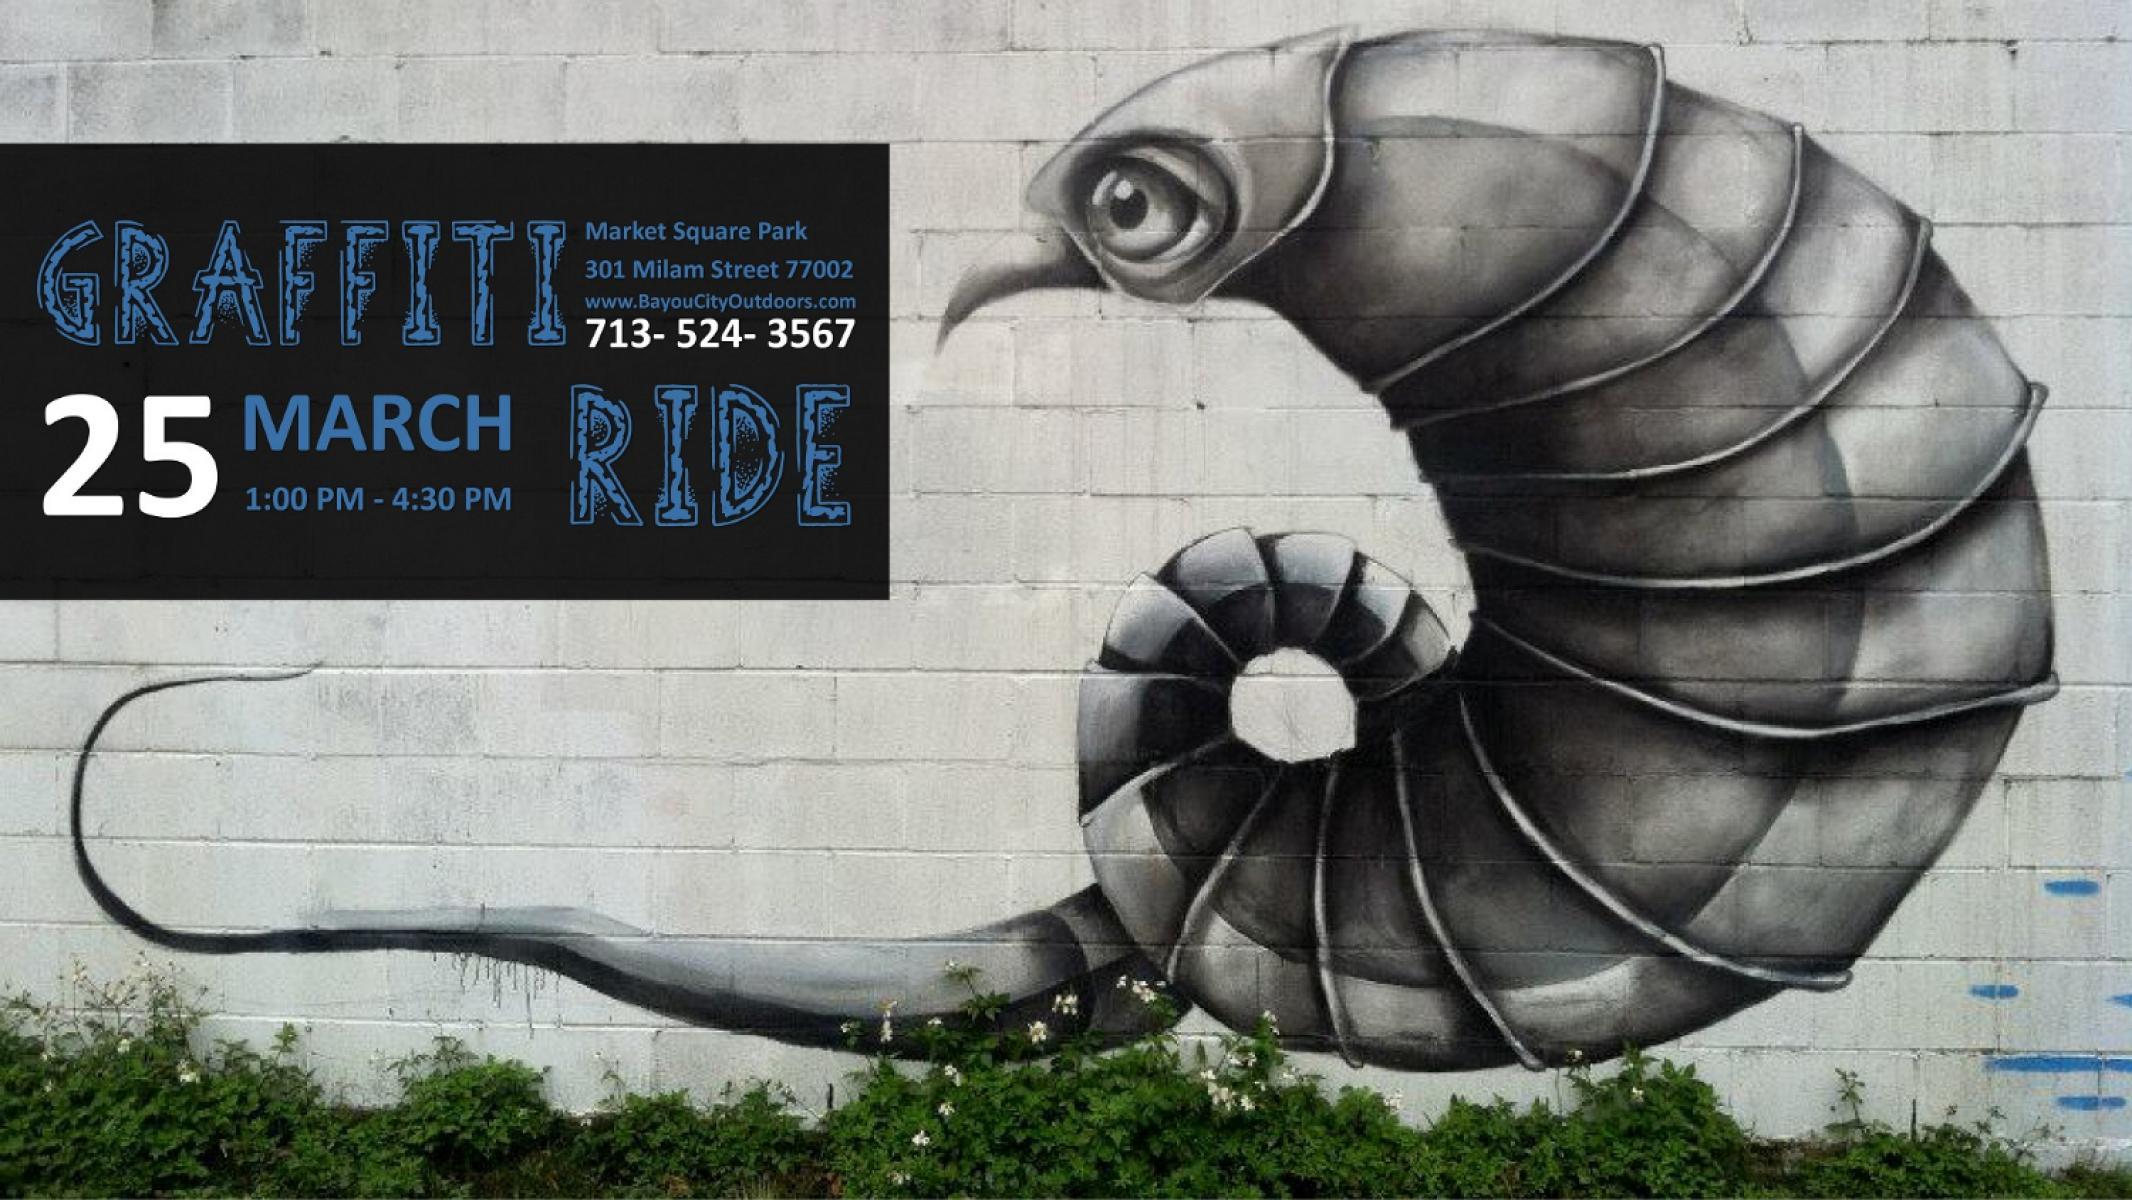 Bco graffiti art bike ride